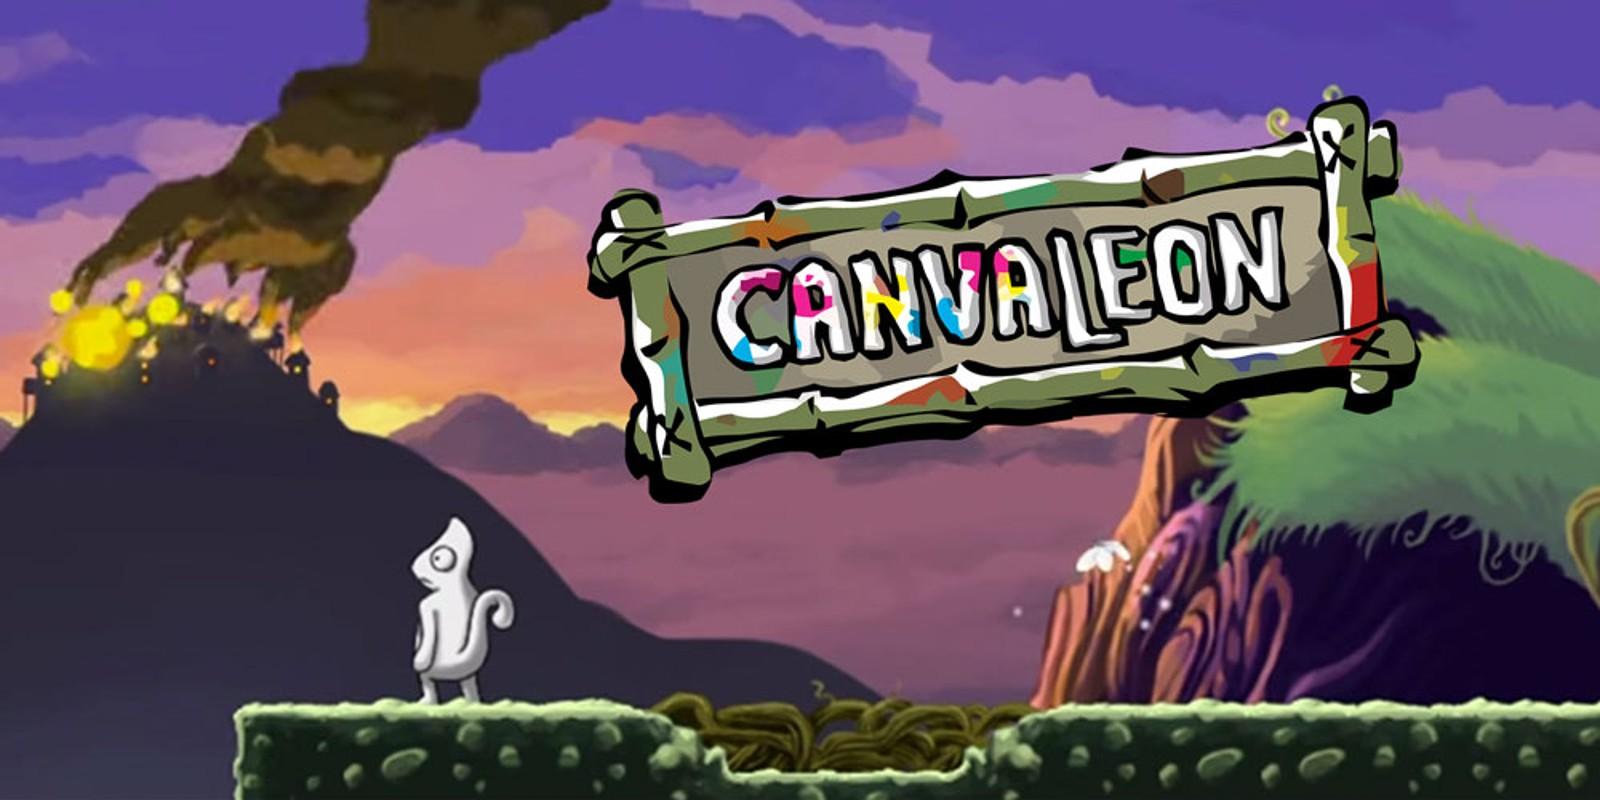 Wii U Downloadable Games : Canvaleon wii u download software games nintendo